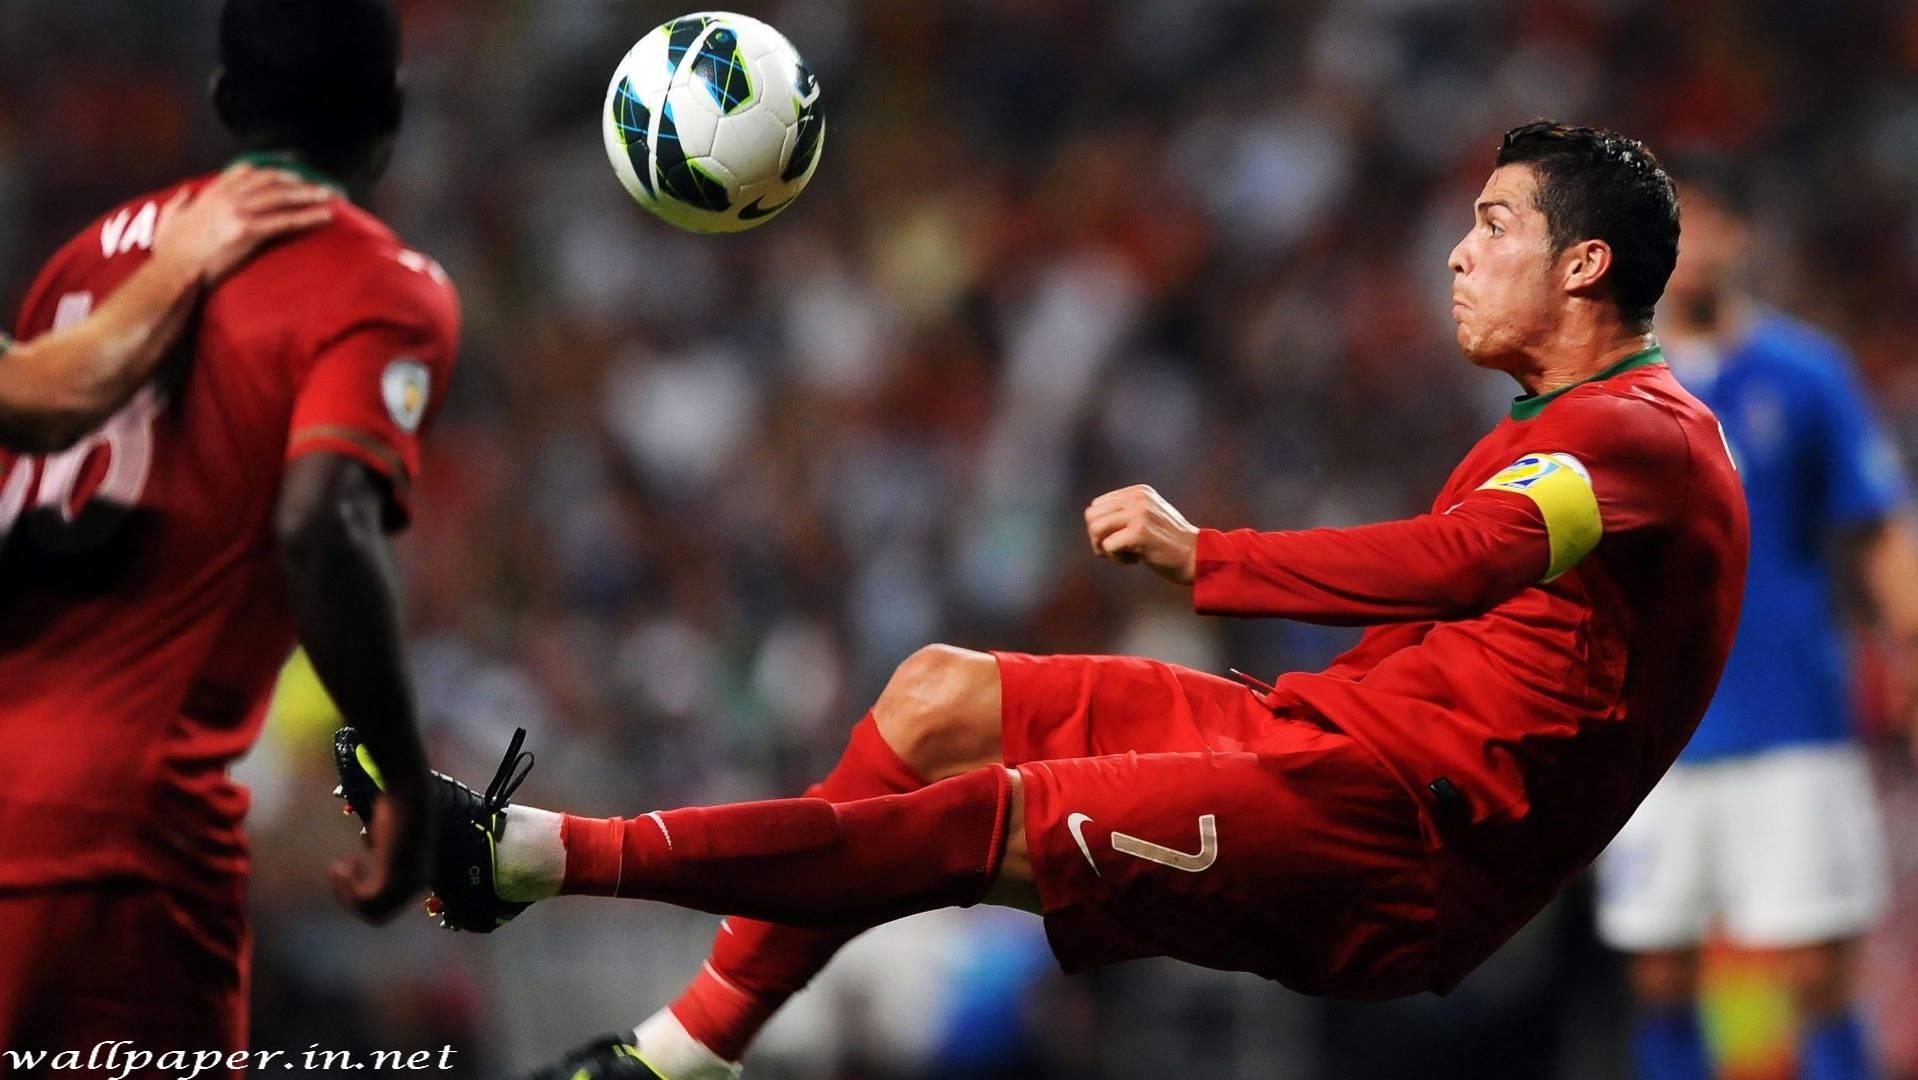 Cristiano Ronaldo HD Wallpapers Fifa World Cup 2014